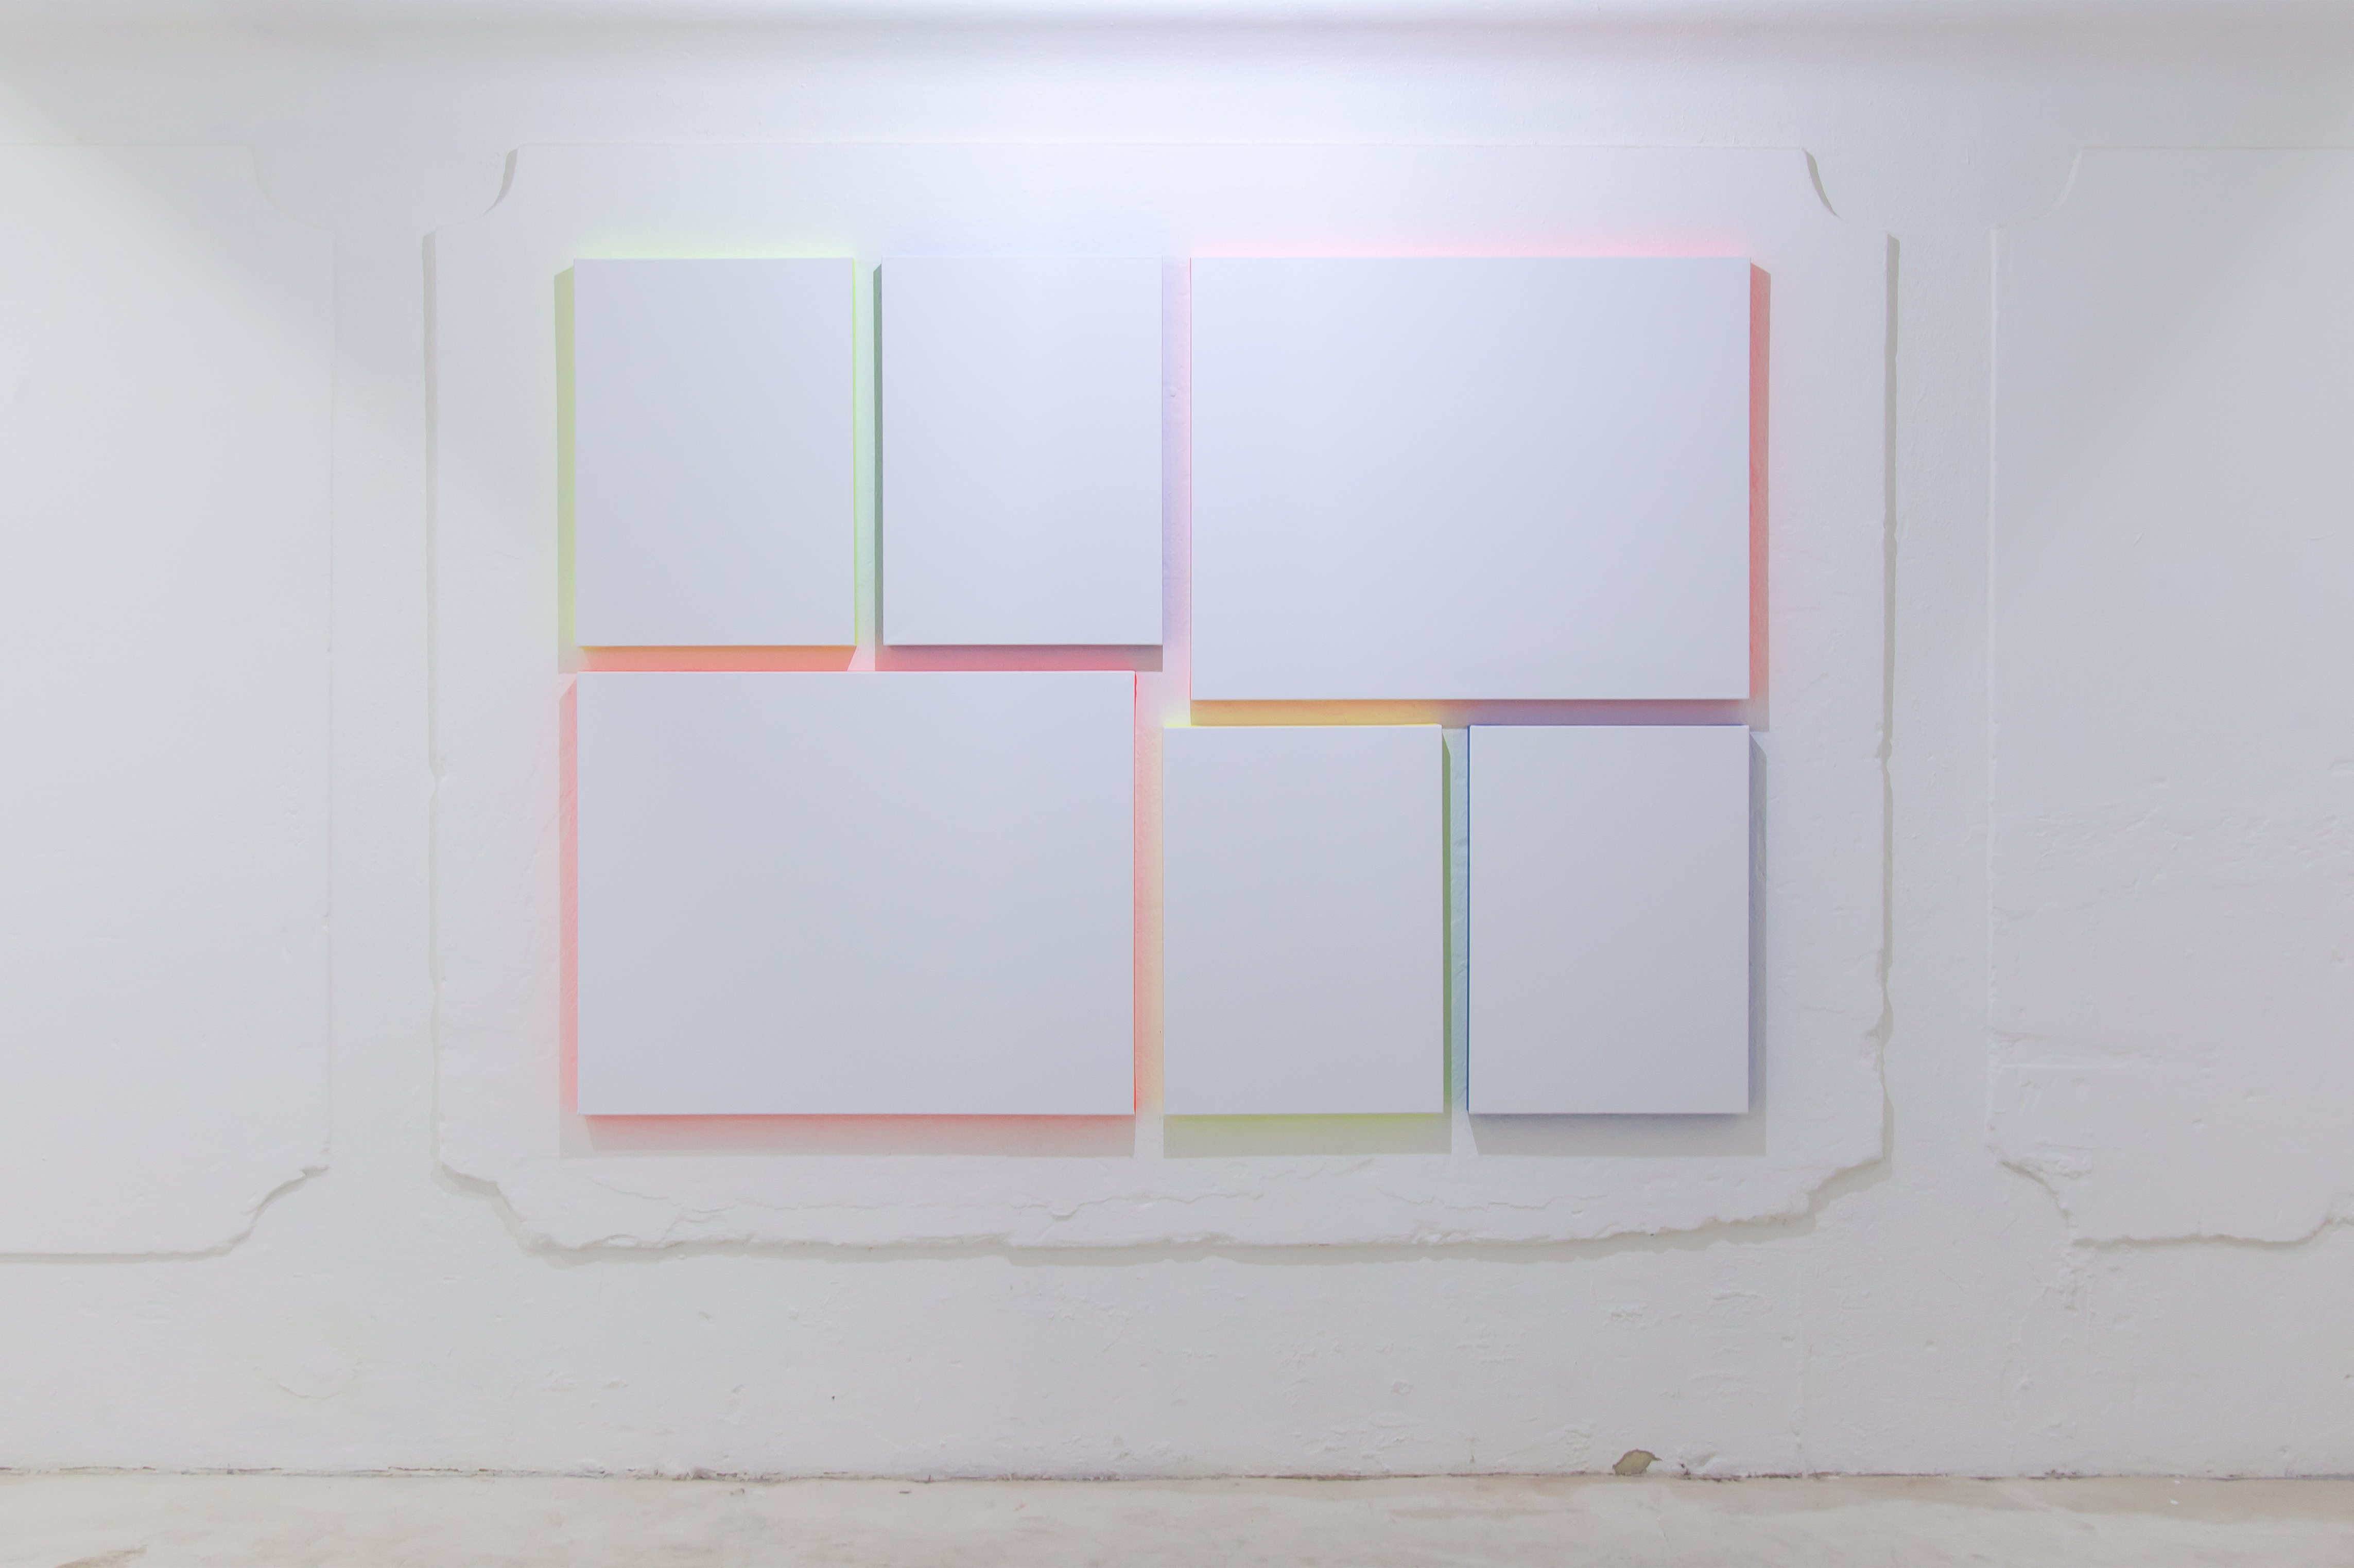 Untitled (to A.C.) Alkyd enamel on canvas 155 x 210 cm 2016